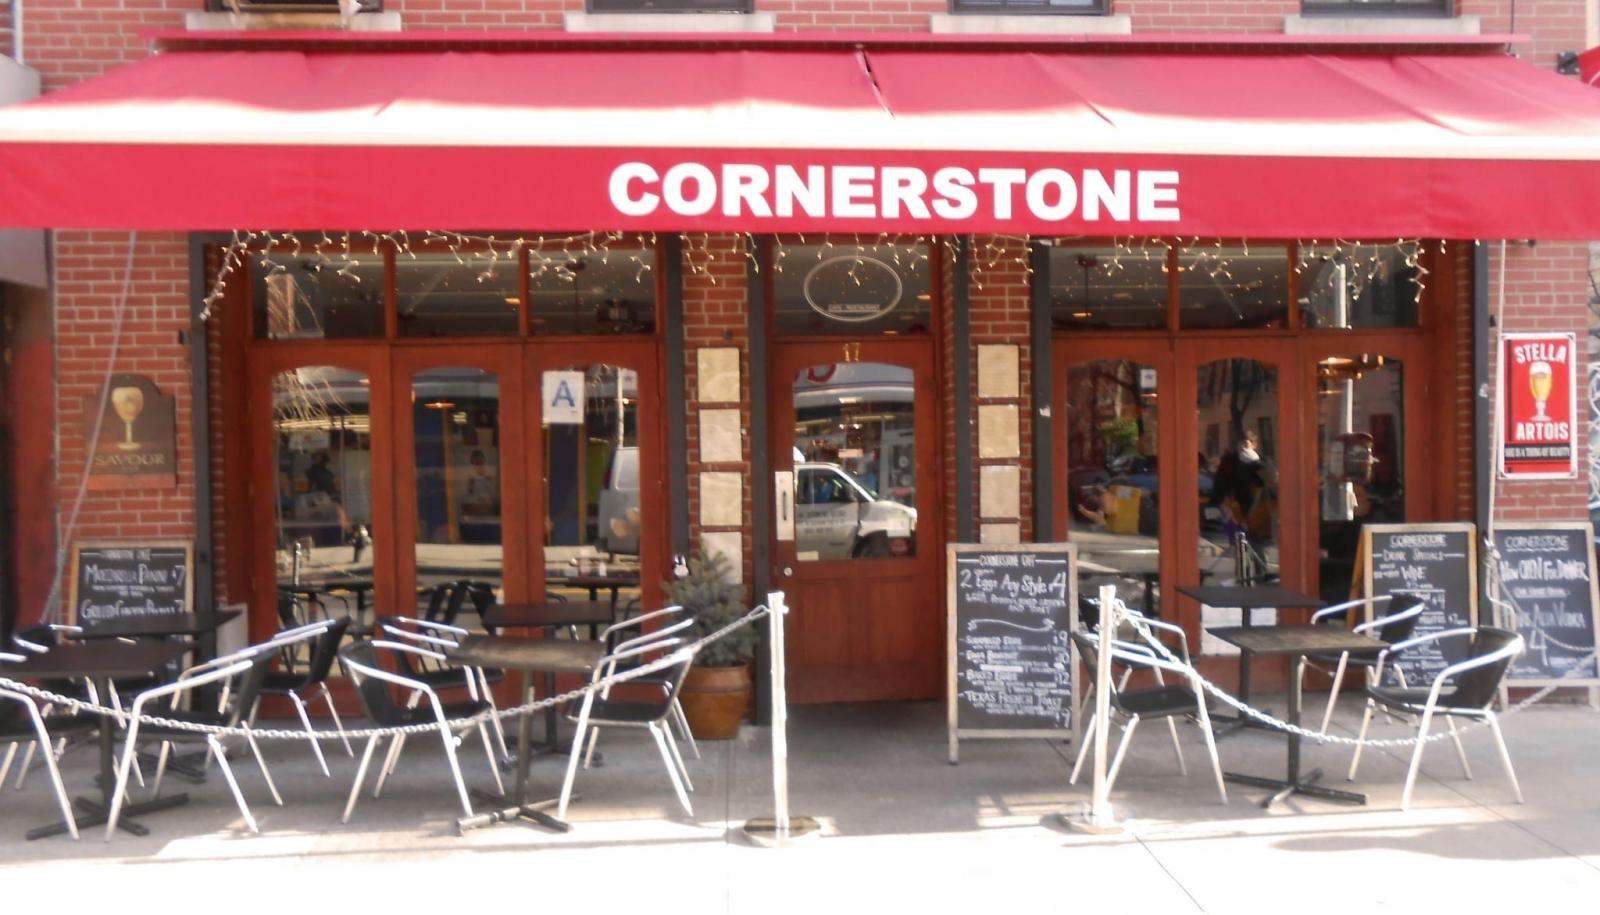 The Cornerstone Cafe on Avenue B in Manhattan's East Village